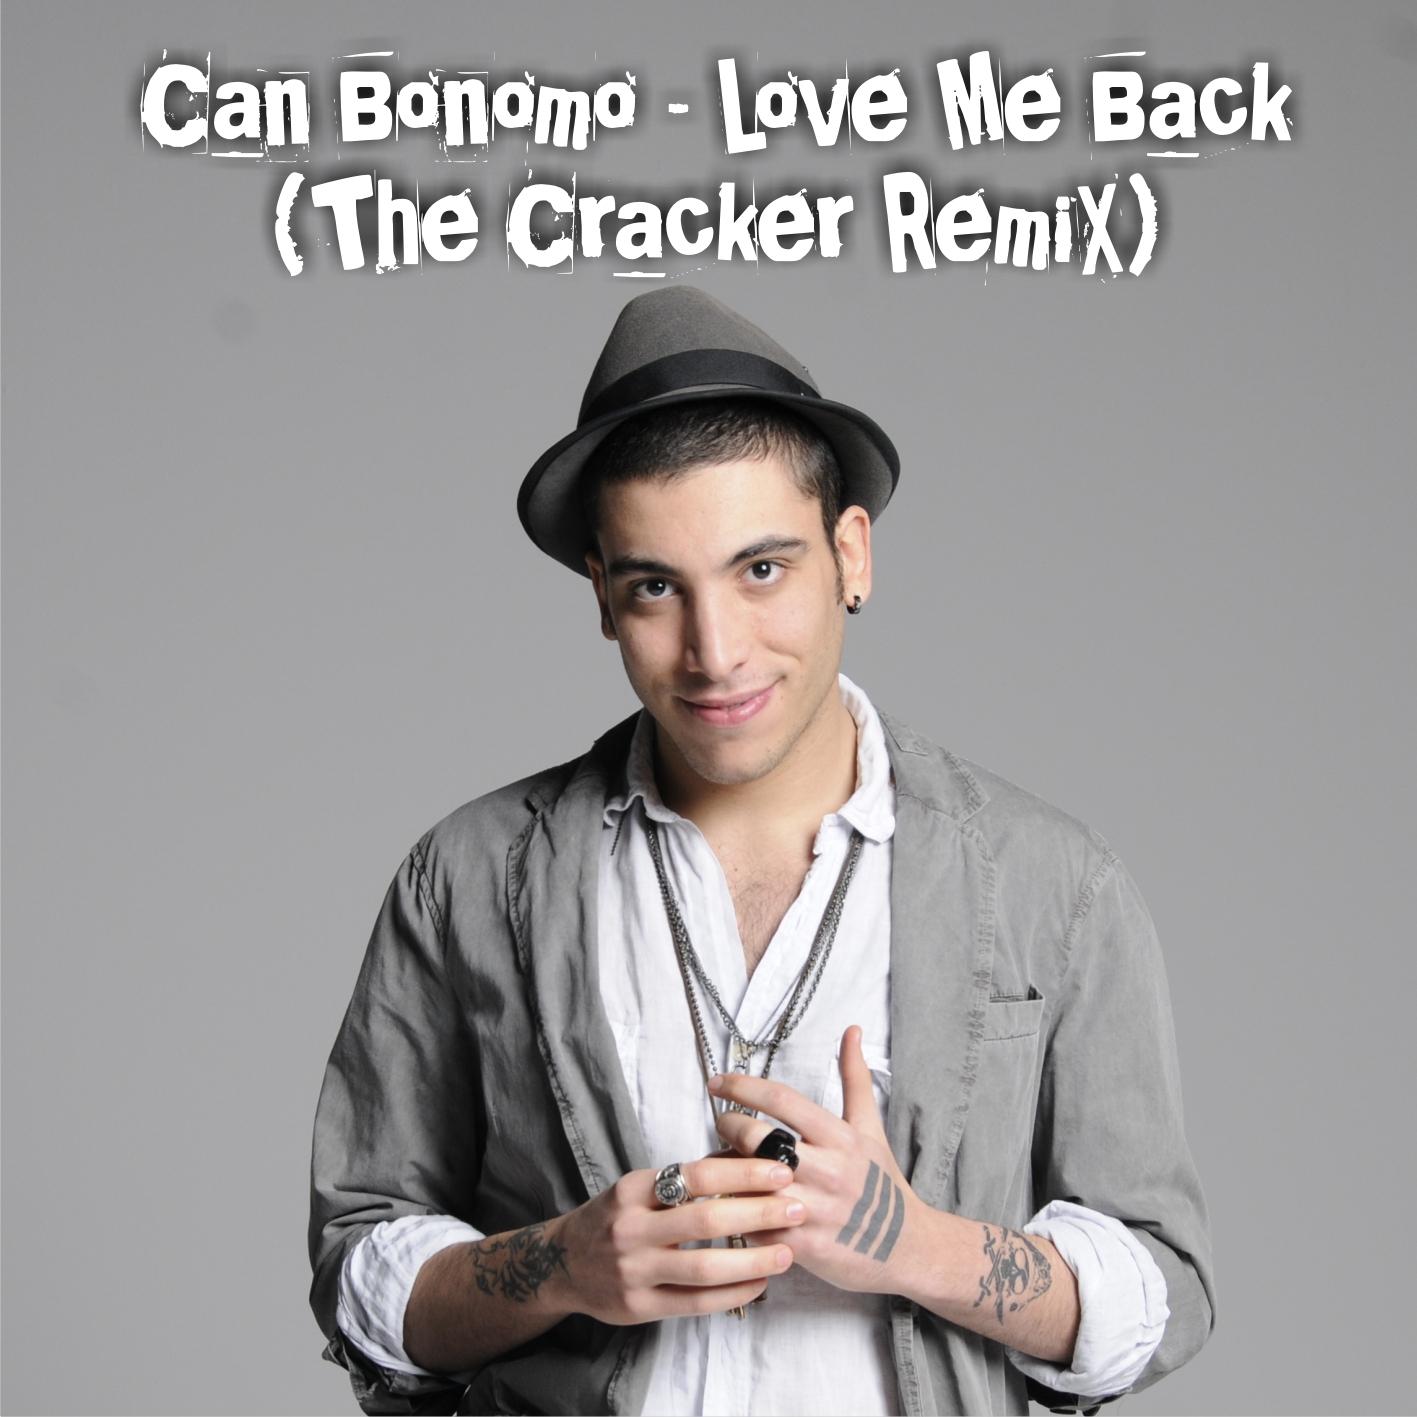 Can Bonomo Love Me Back The Cracker Reboot